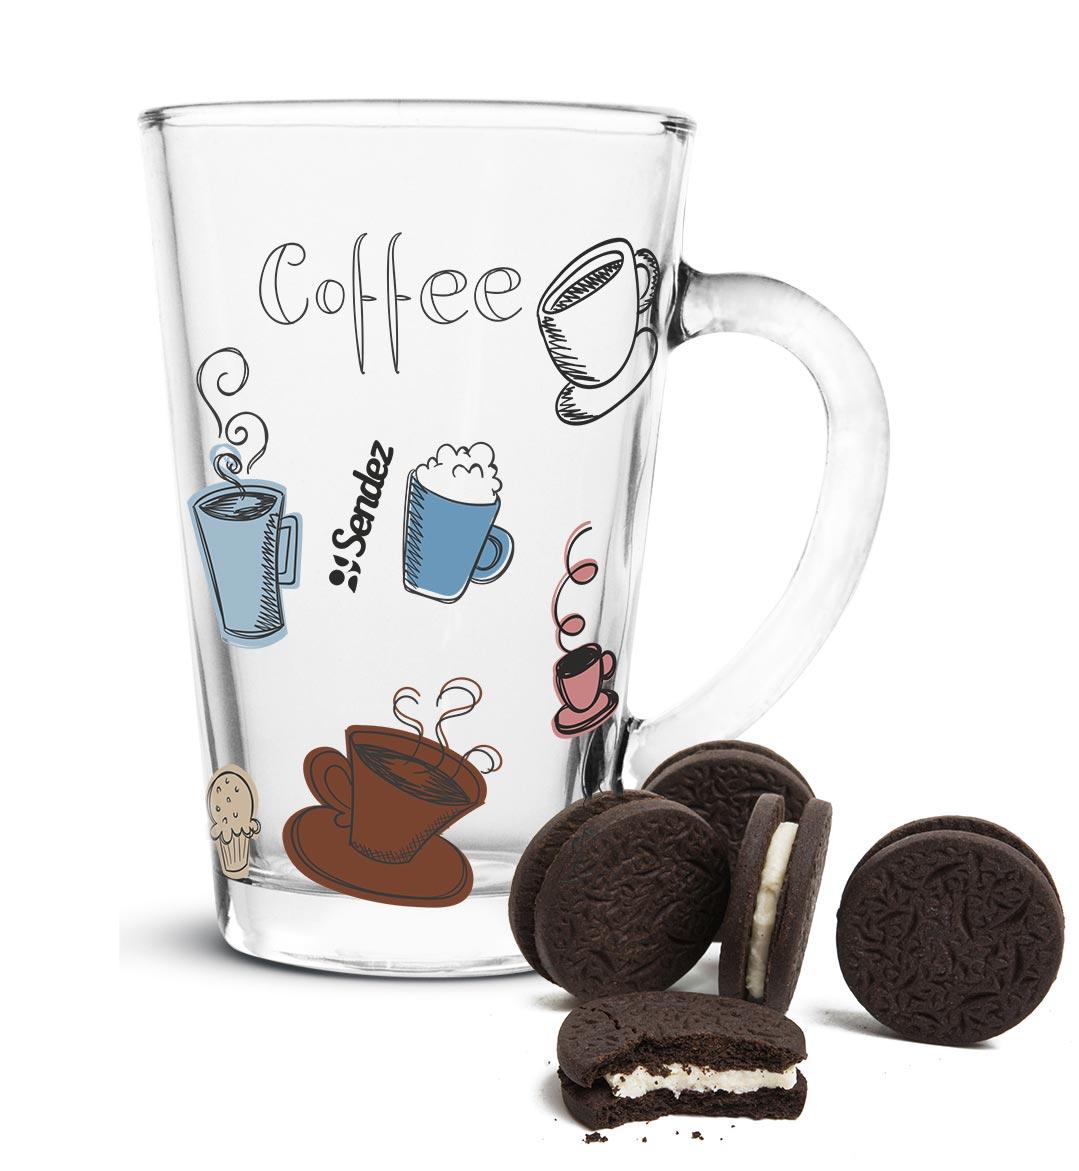 6 latte macchiato gl ser 300ml kaffeegl ser teeglas bunter aufdruck ebay. Black Bedroom Furniture Sets. Home Design Ideas